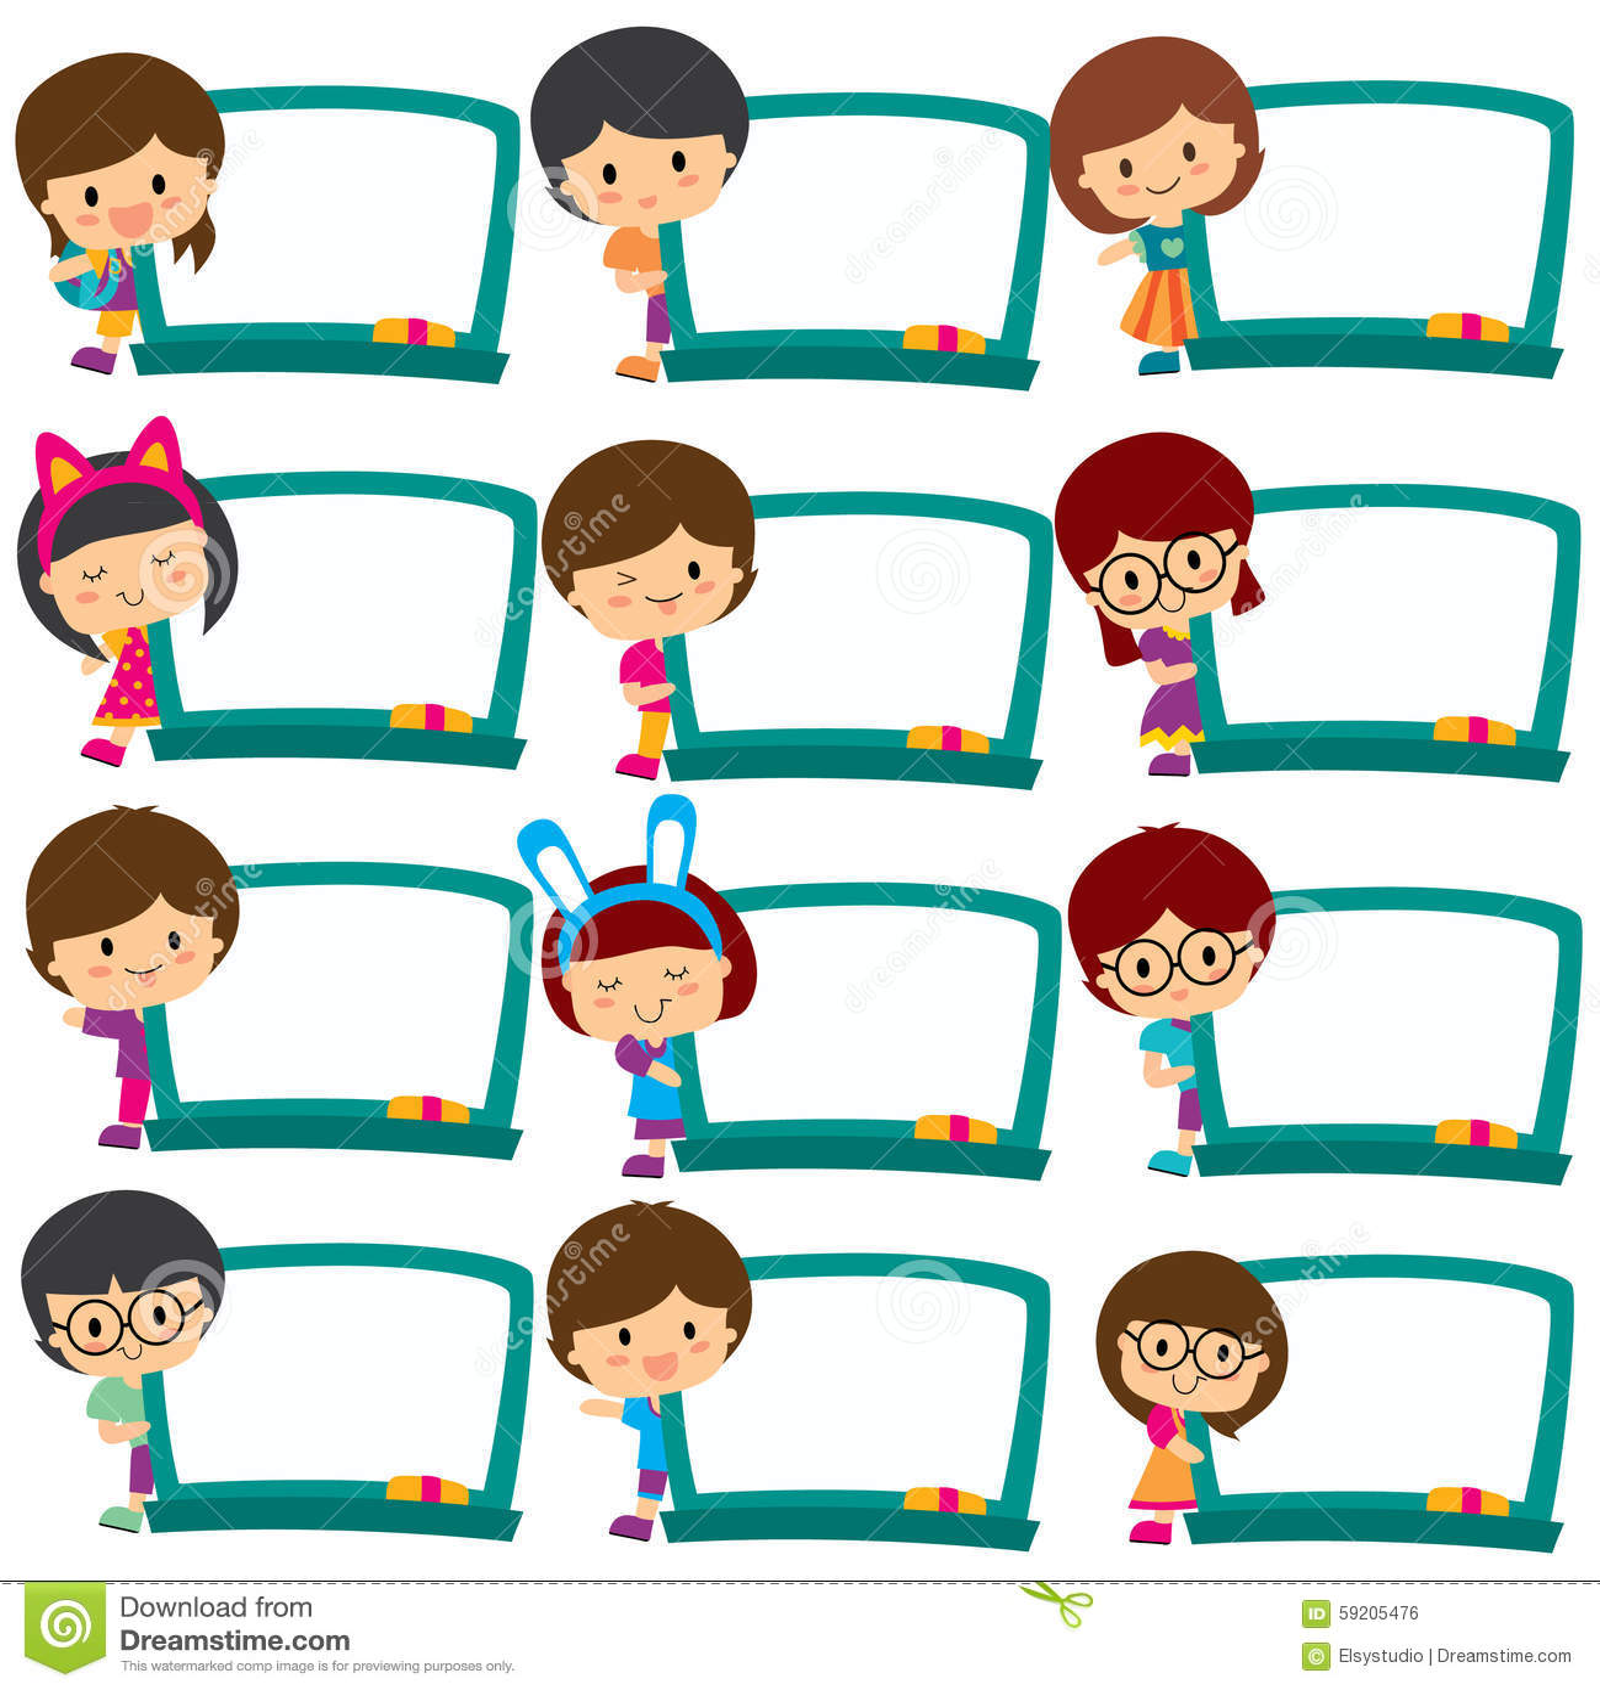 Kids Board Frames Clip Art Set Stock Vector - Illustration of human ...